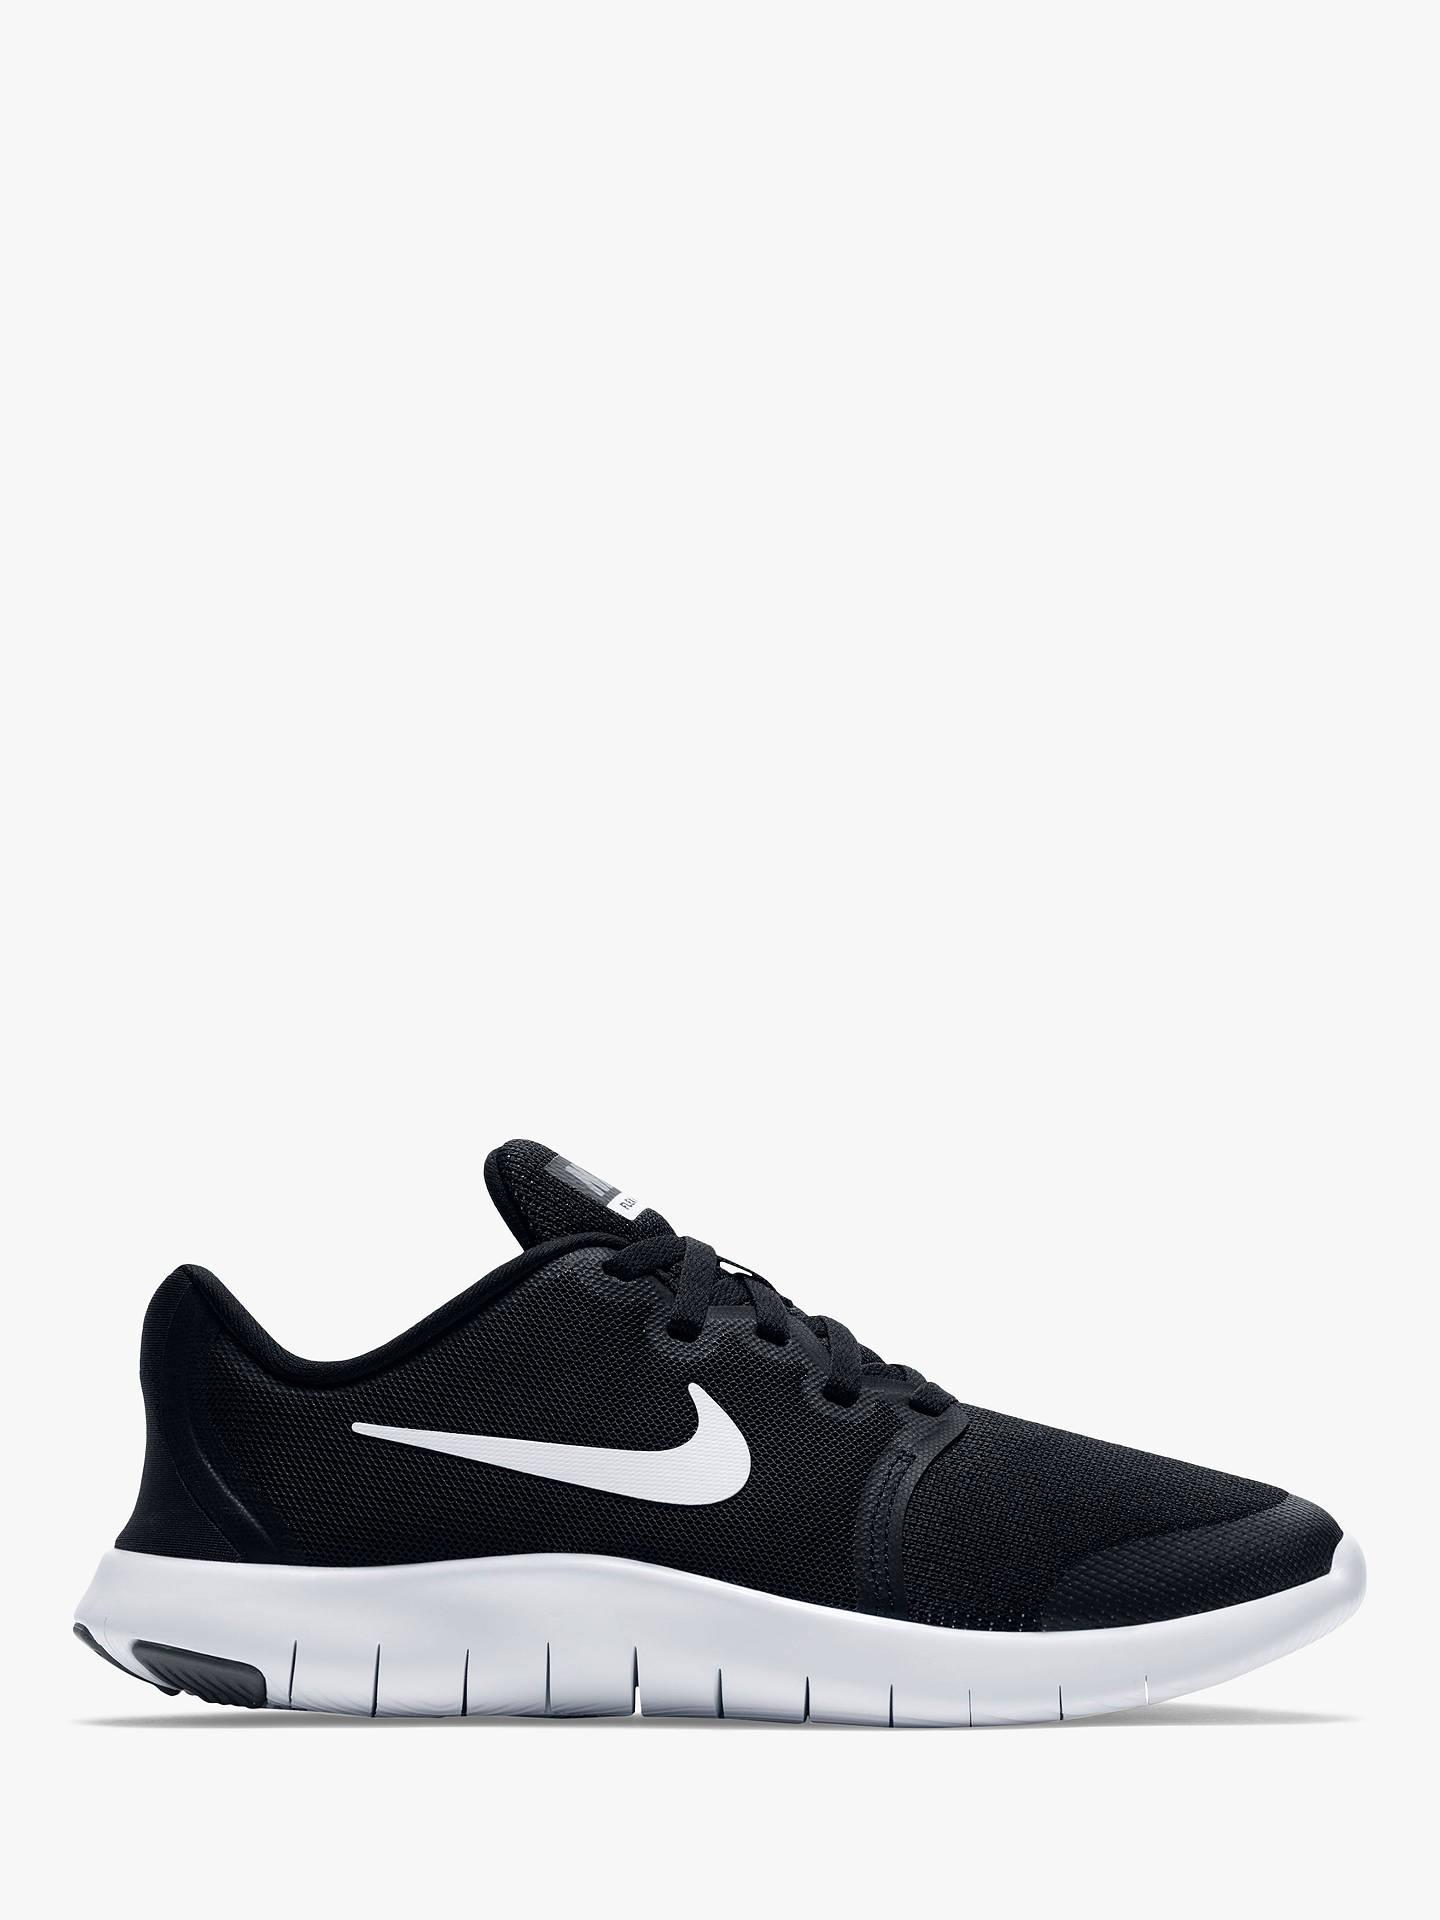 presumir fuga Desear  Nike Children's Flex Contact 2 Trainers, Black/Cool Grey at John Lewis &  Partners